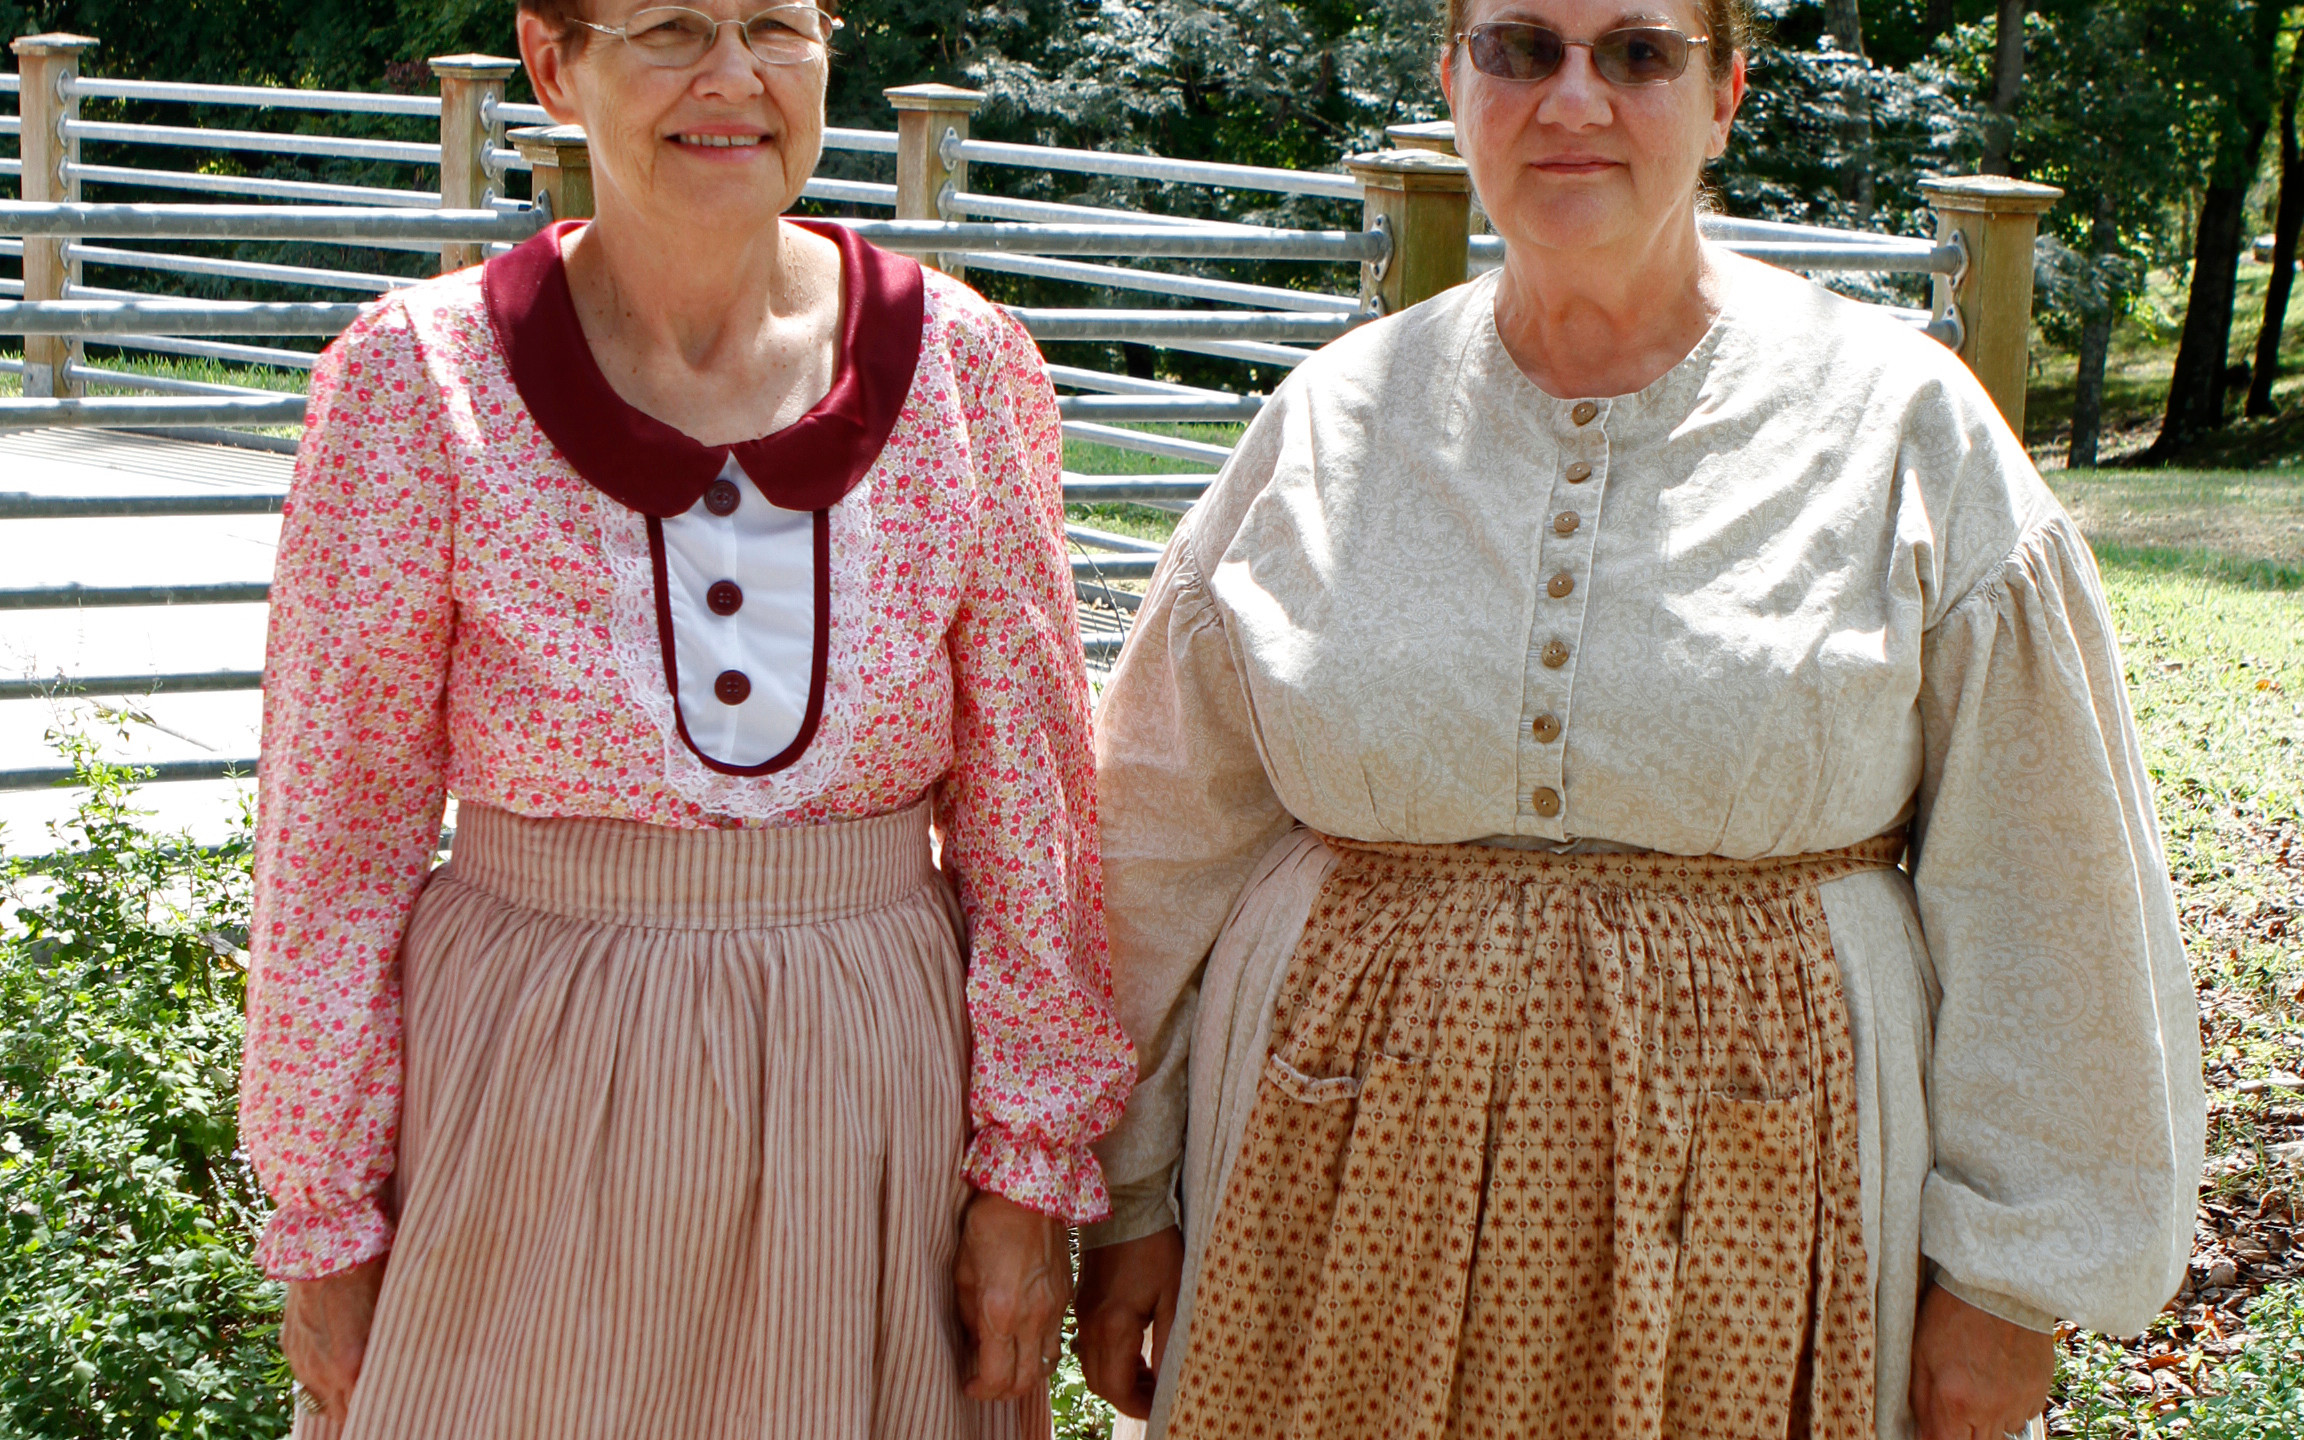 Frances Sumner, Phyllis Smith